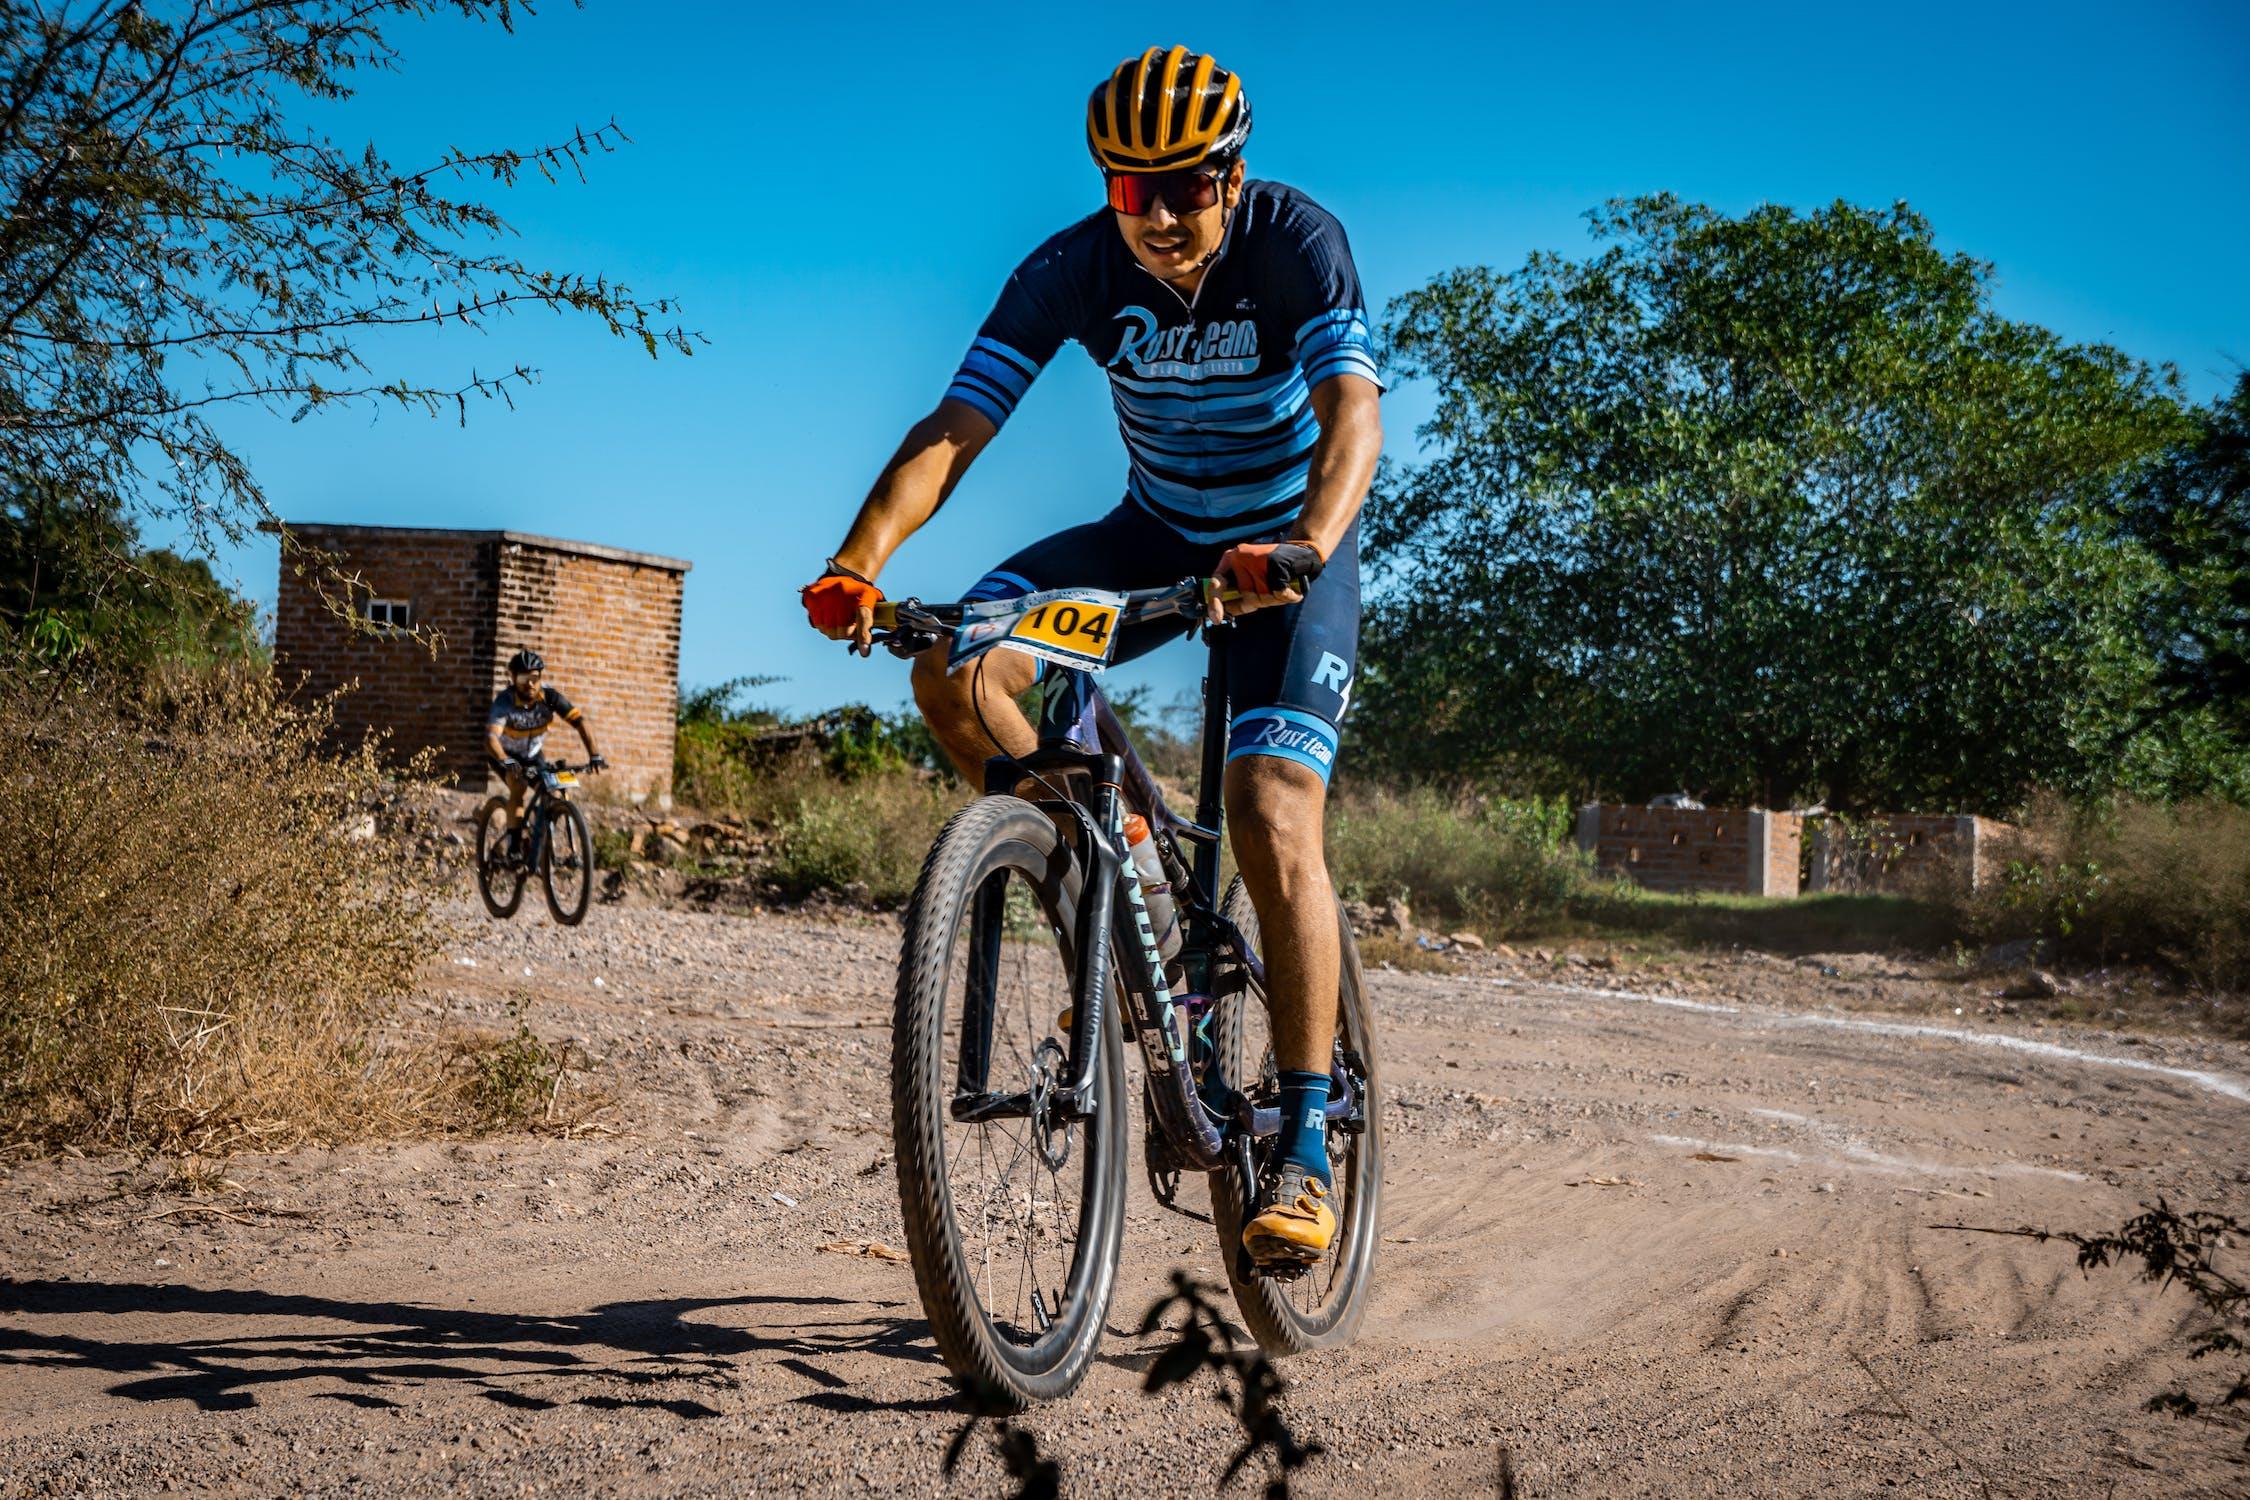 Best Mountain Bikes For Intermediate Riders In 2021